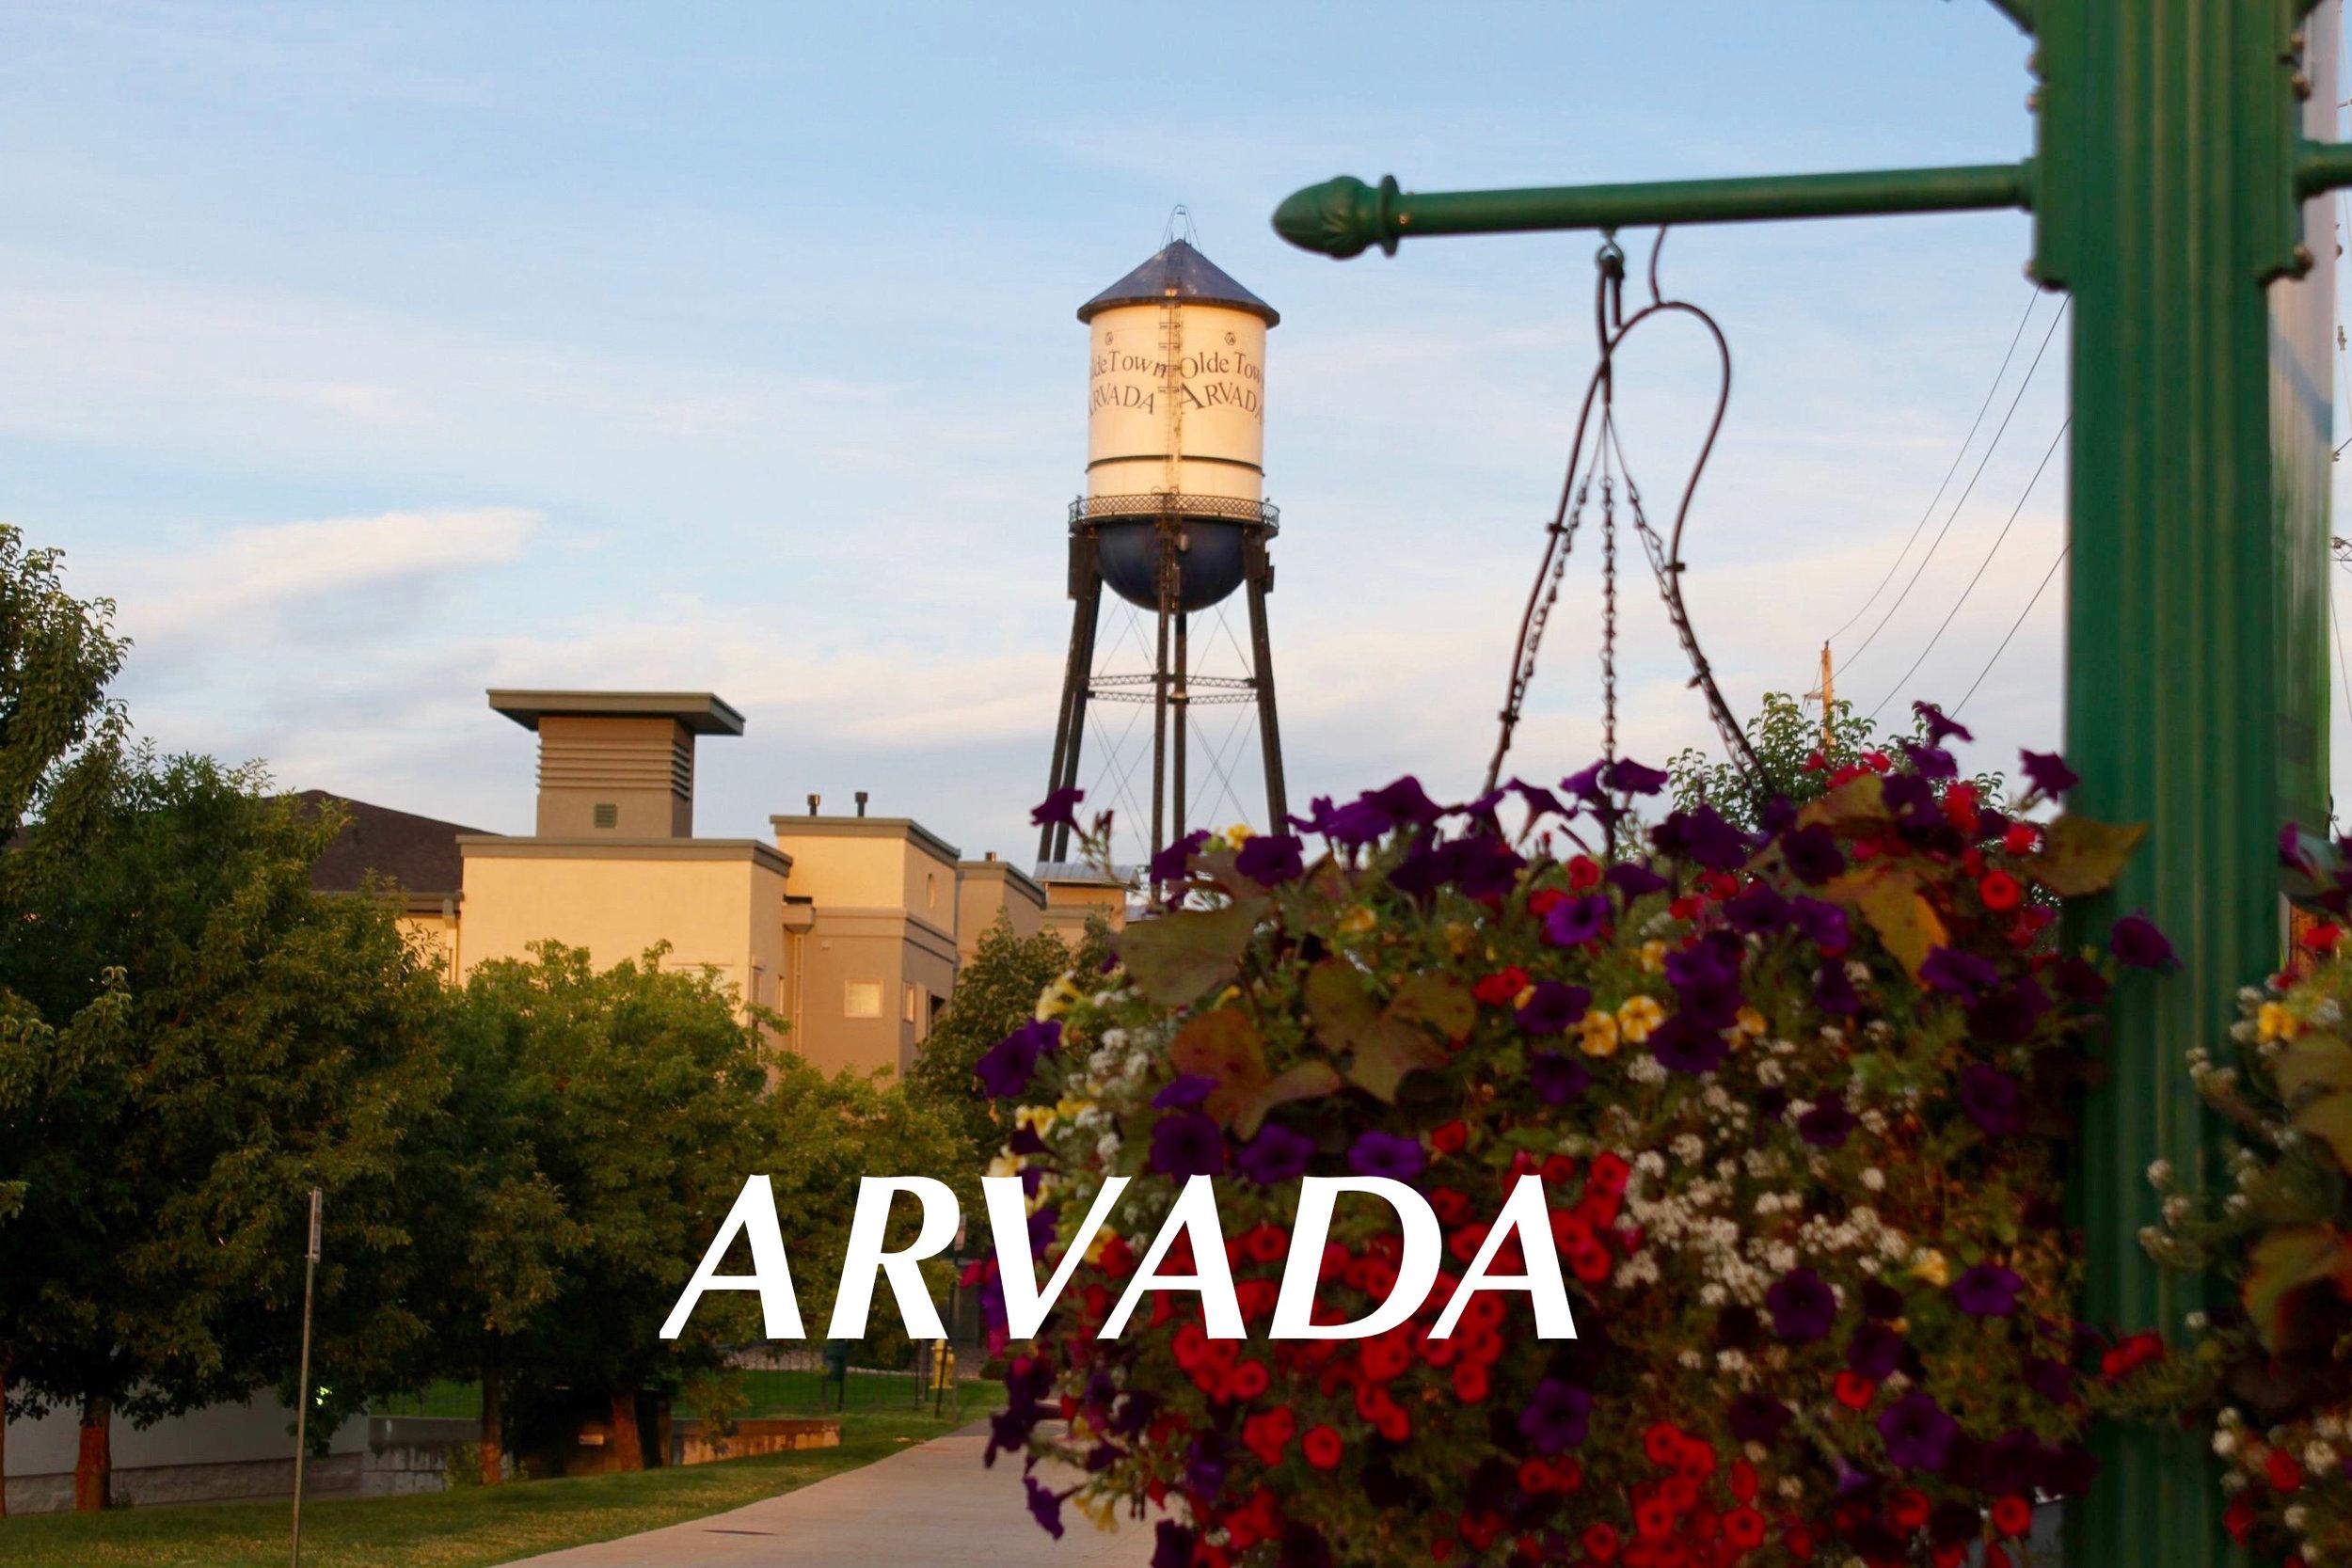 Arvada Duplex - Just Listed